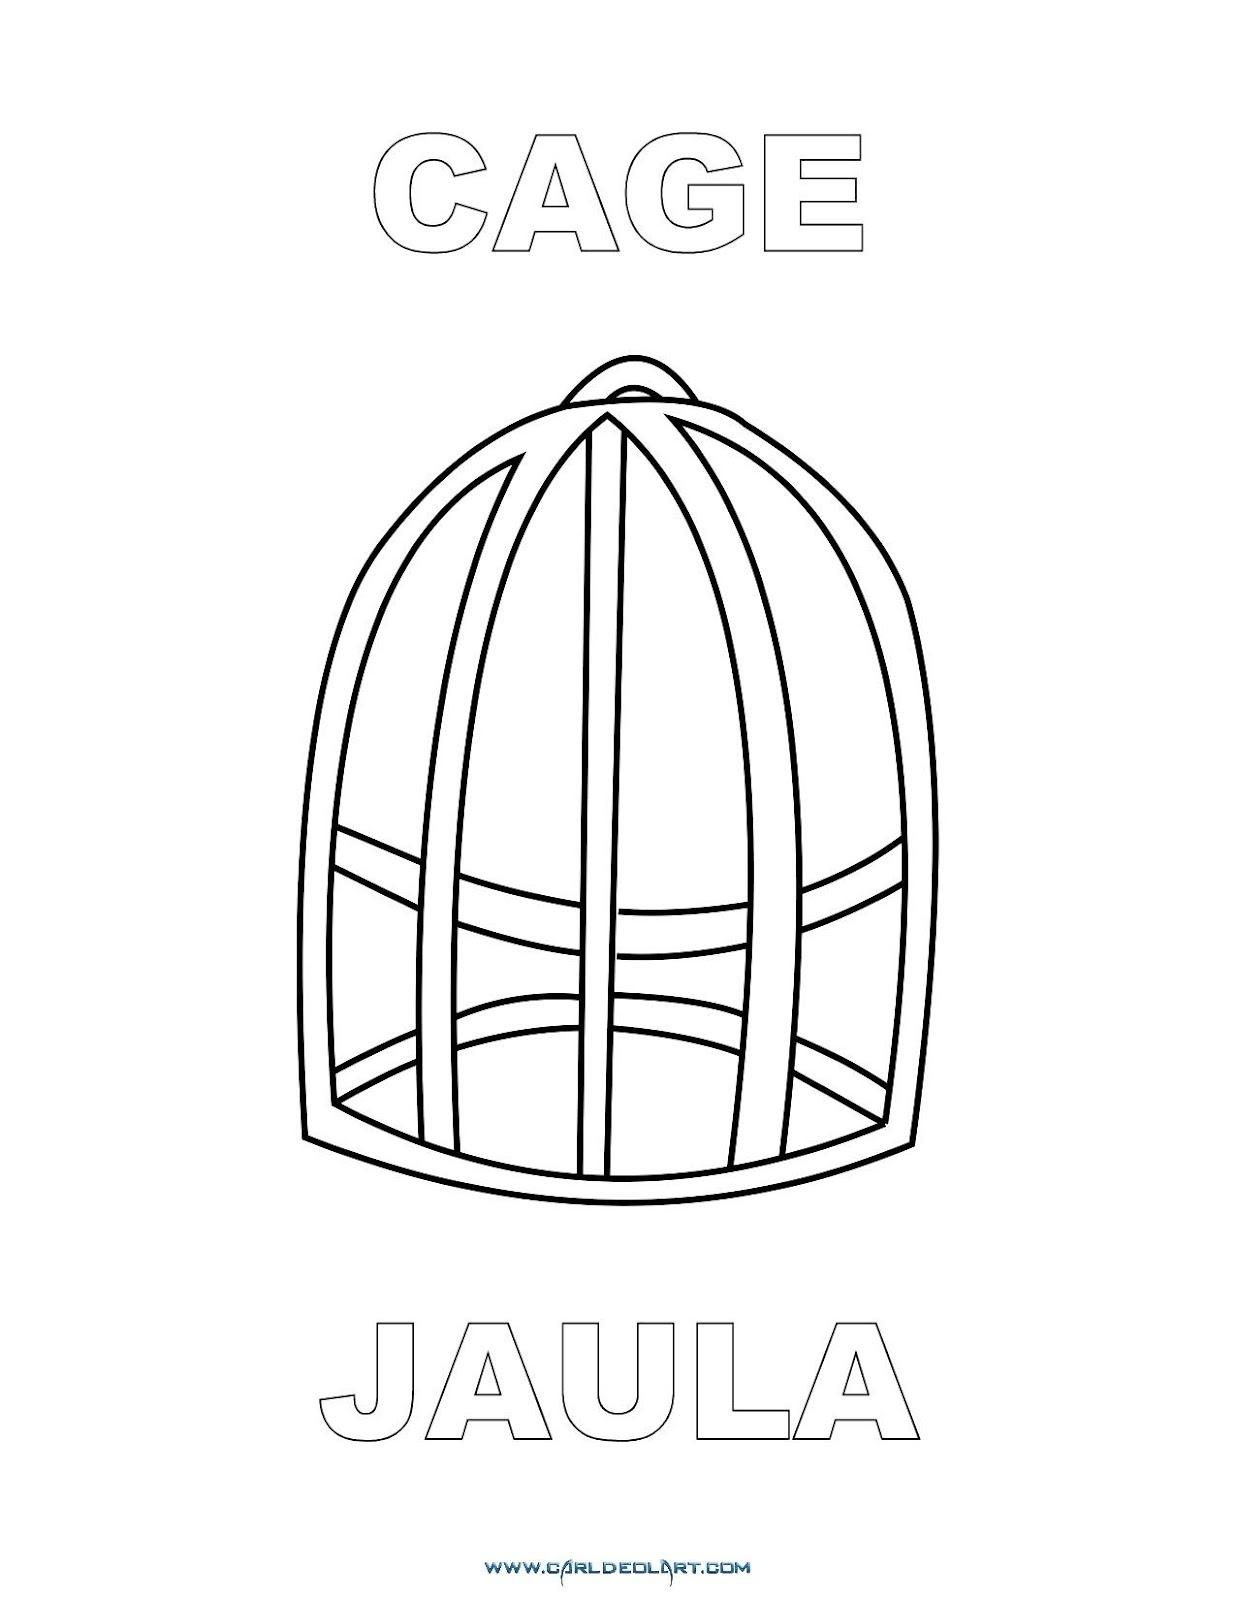 Dibujos Inglés Español Con J Jaula Cage